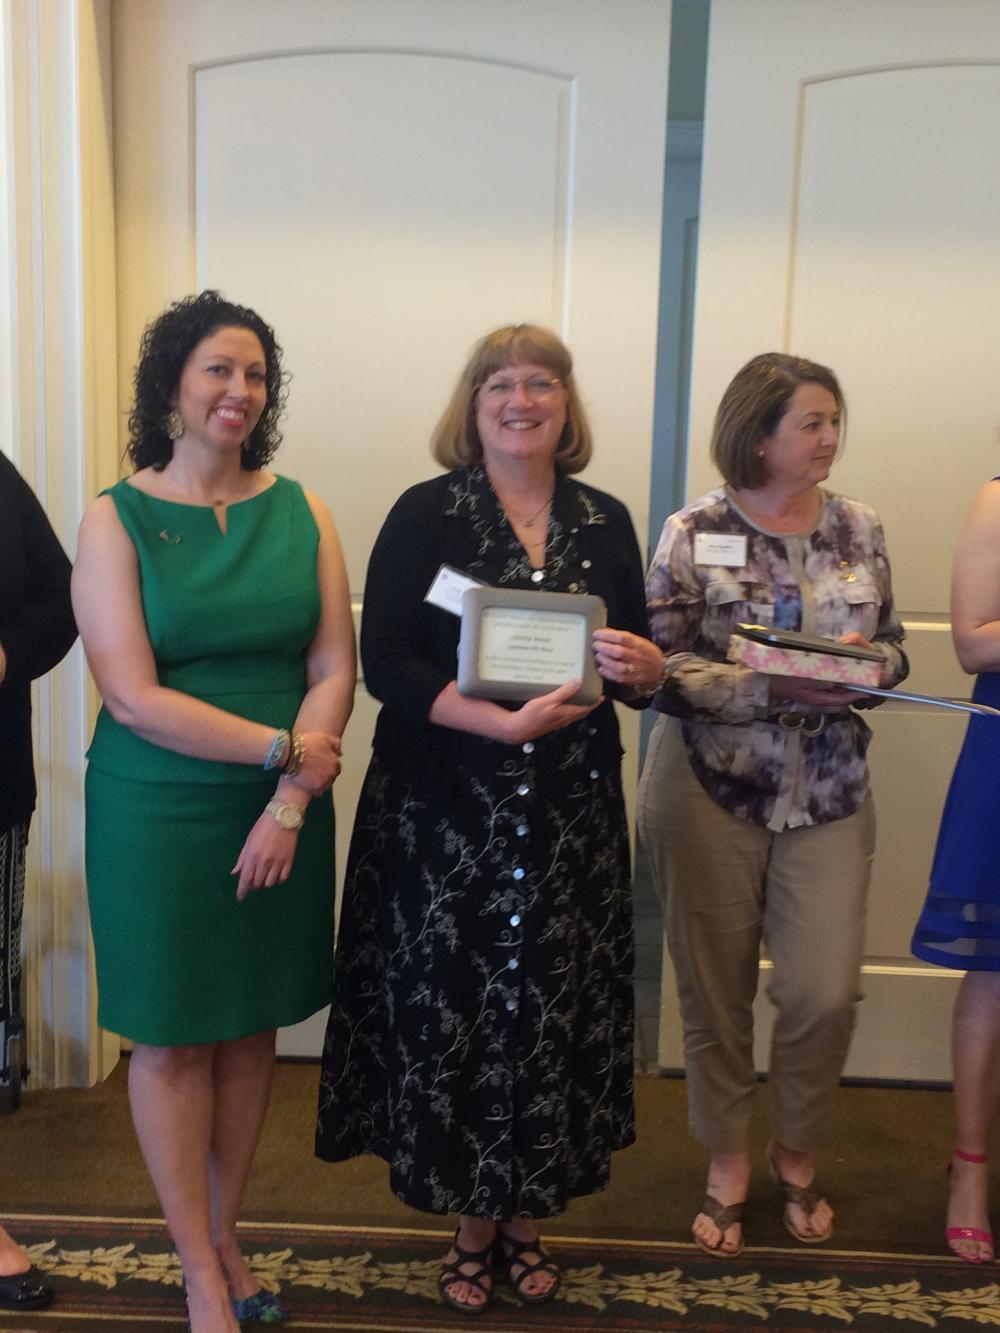 Cindy Gates Wood, WOTY 2016 Award